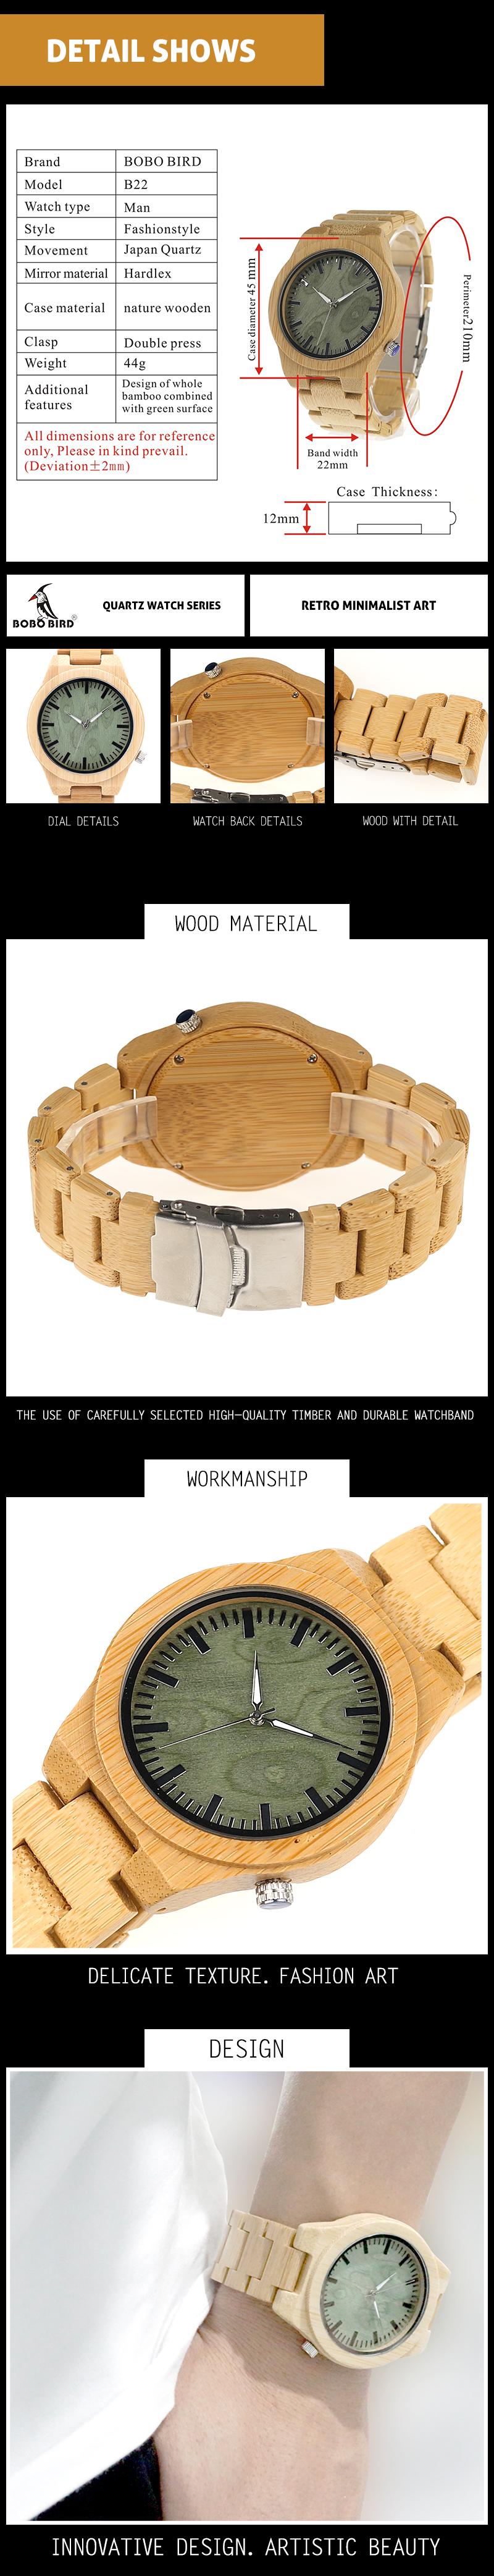 Wristwatch Ghost Eyes Wood Strap Glow Analog Watch with Bamboo Gift Box C-B22 (1)